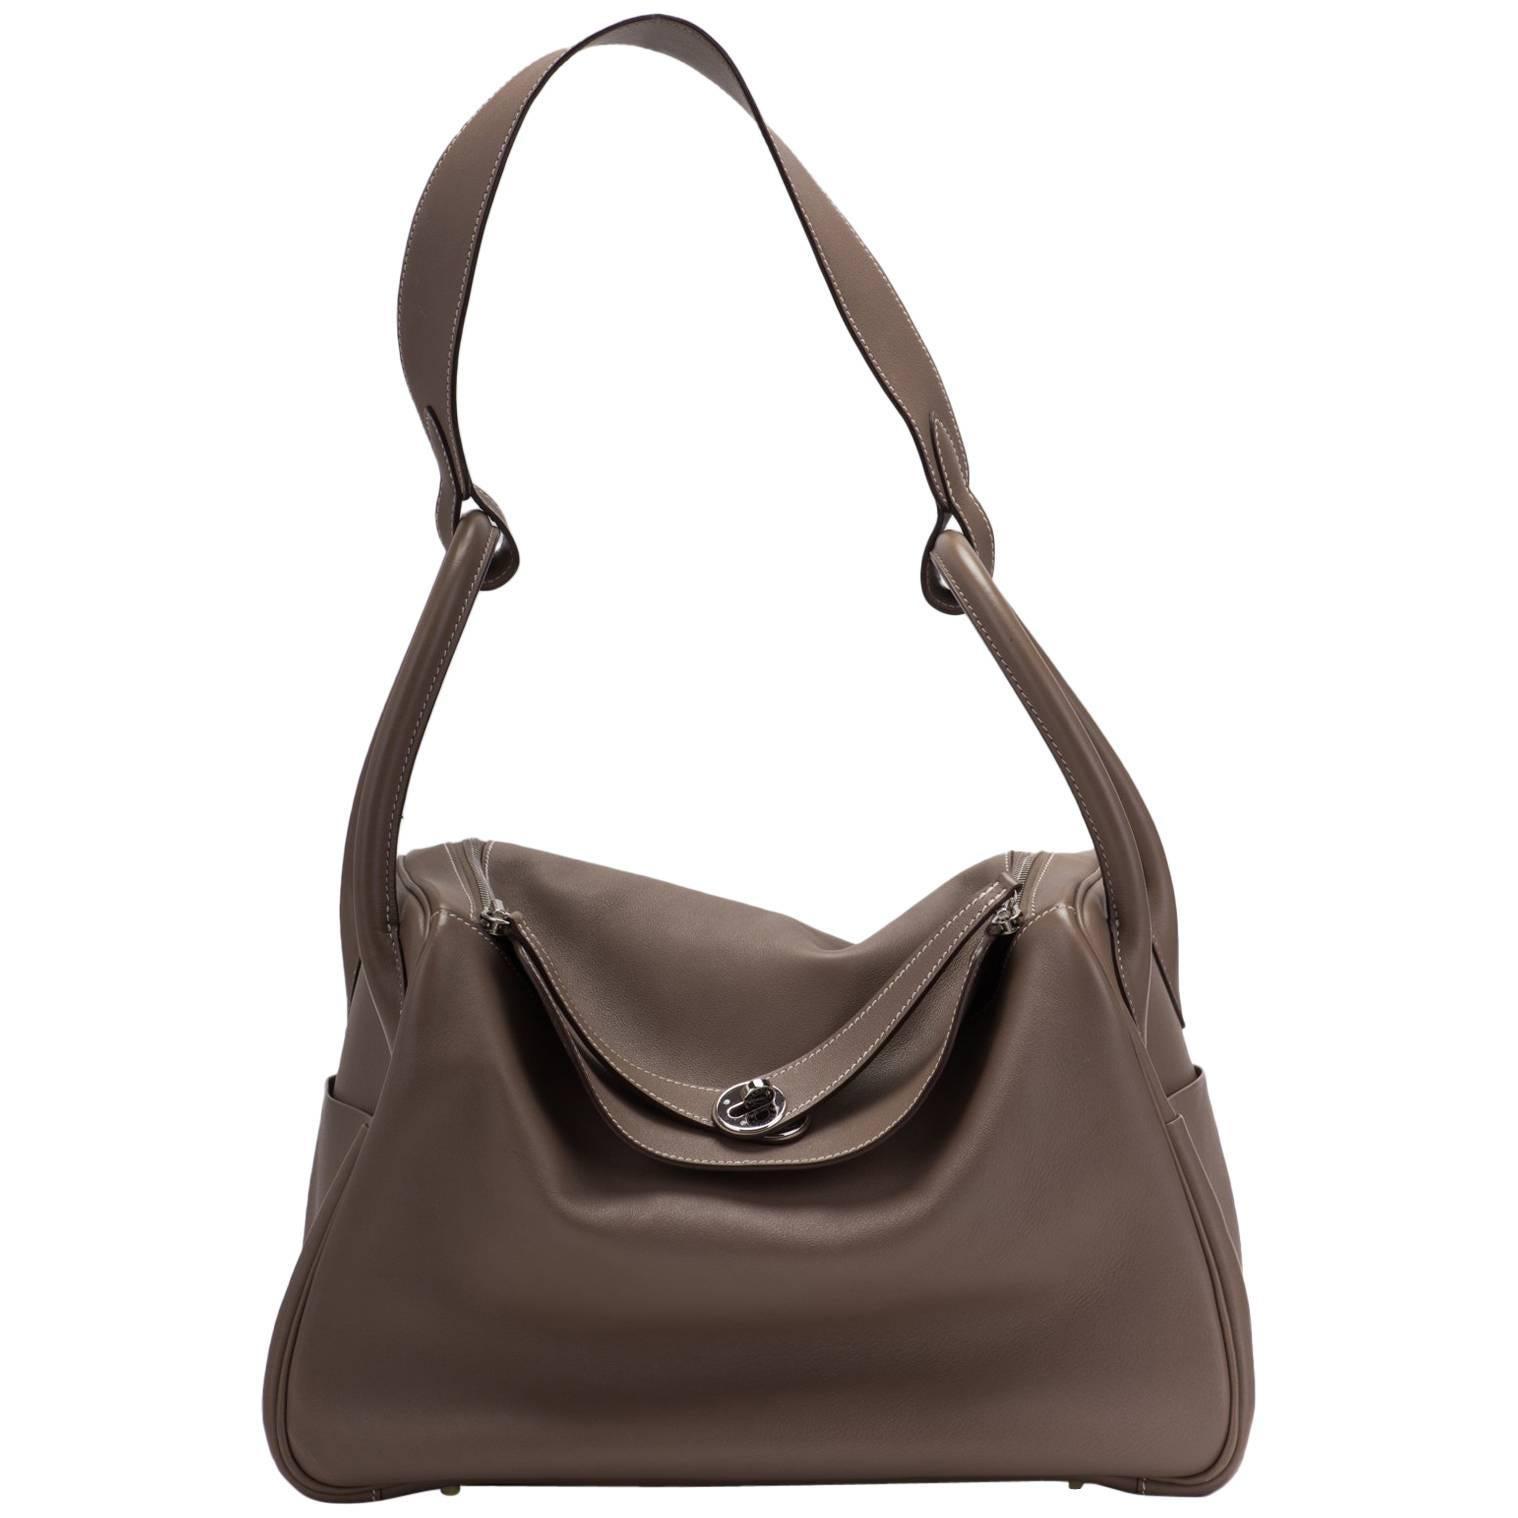 Hermes Etoupe Swift Palladium Lindy Bag 34cm